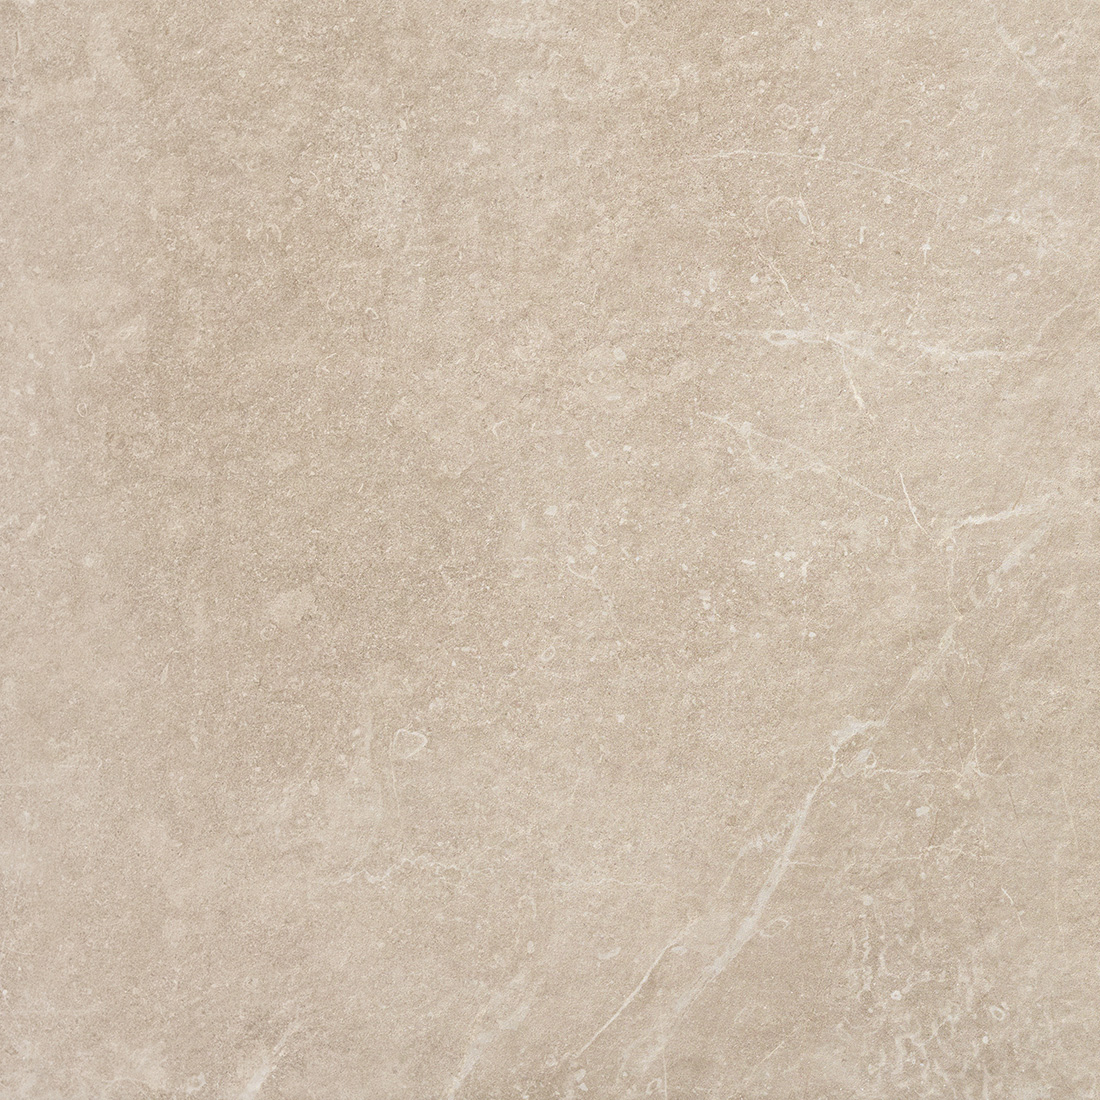 Eternal 60x60x2 Stone Matt R11 1